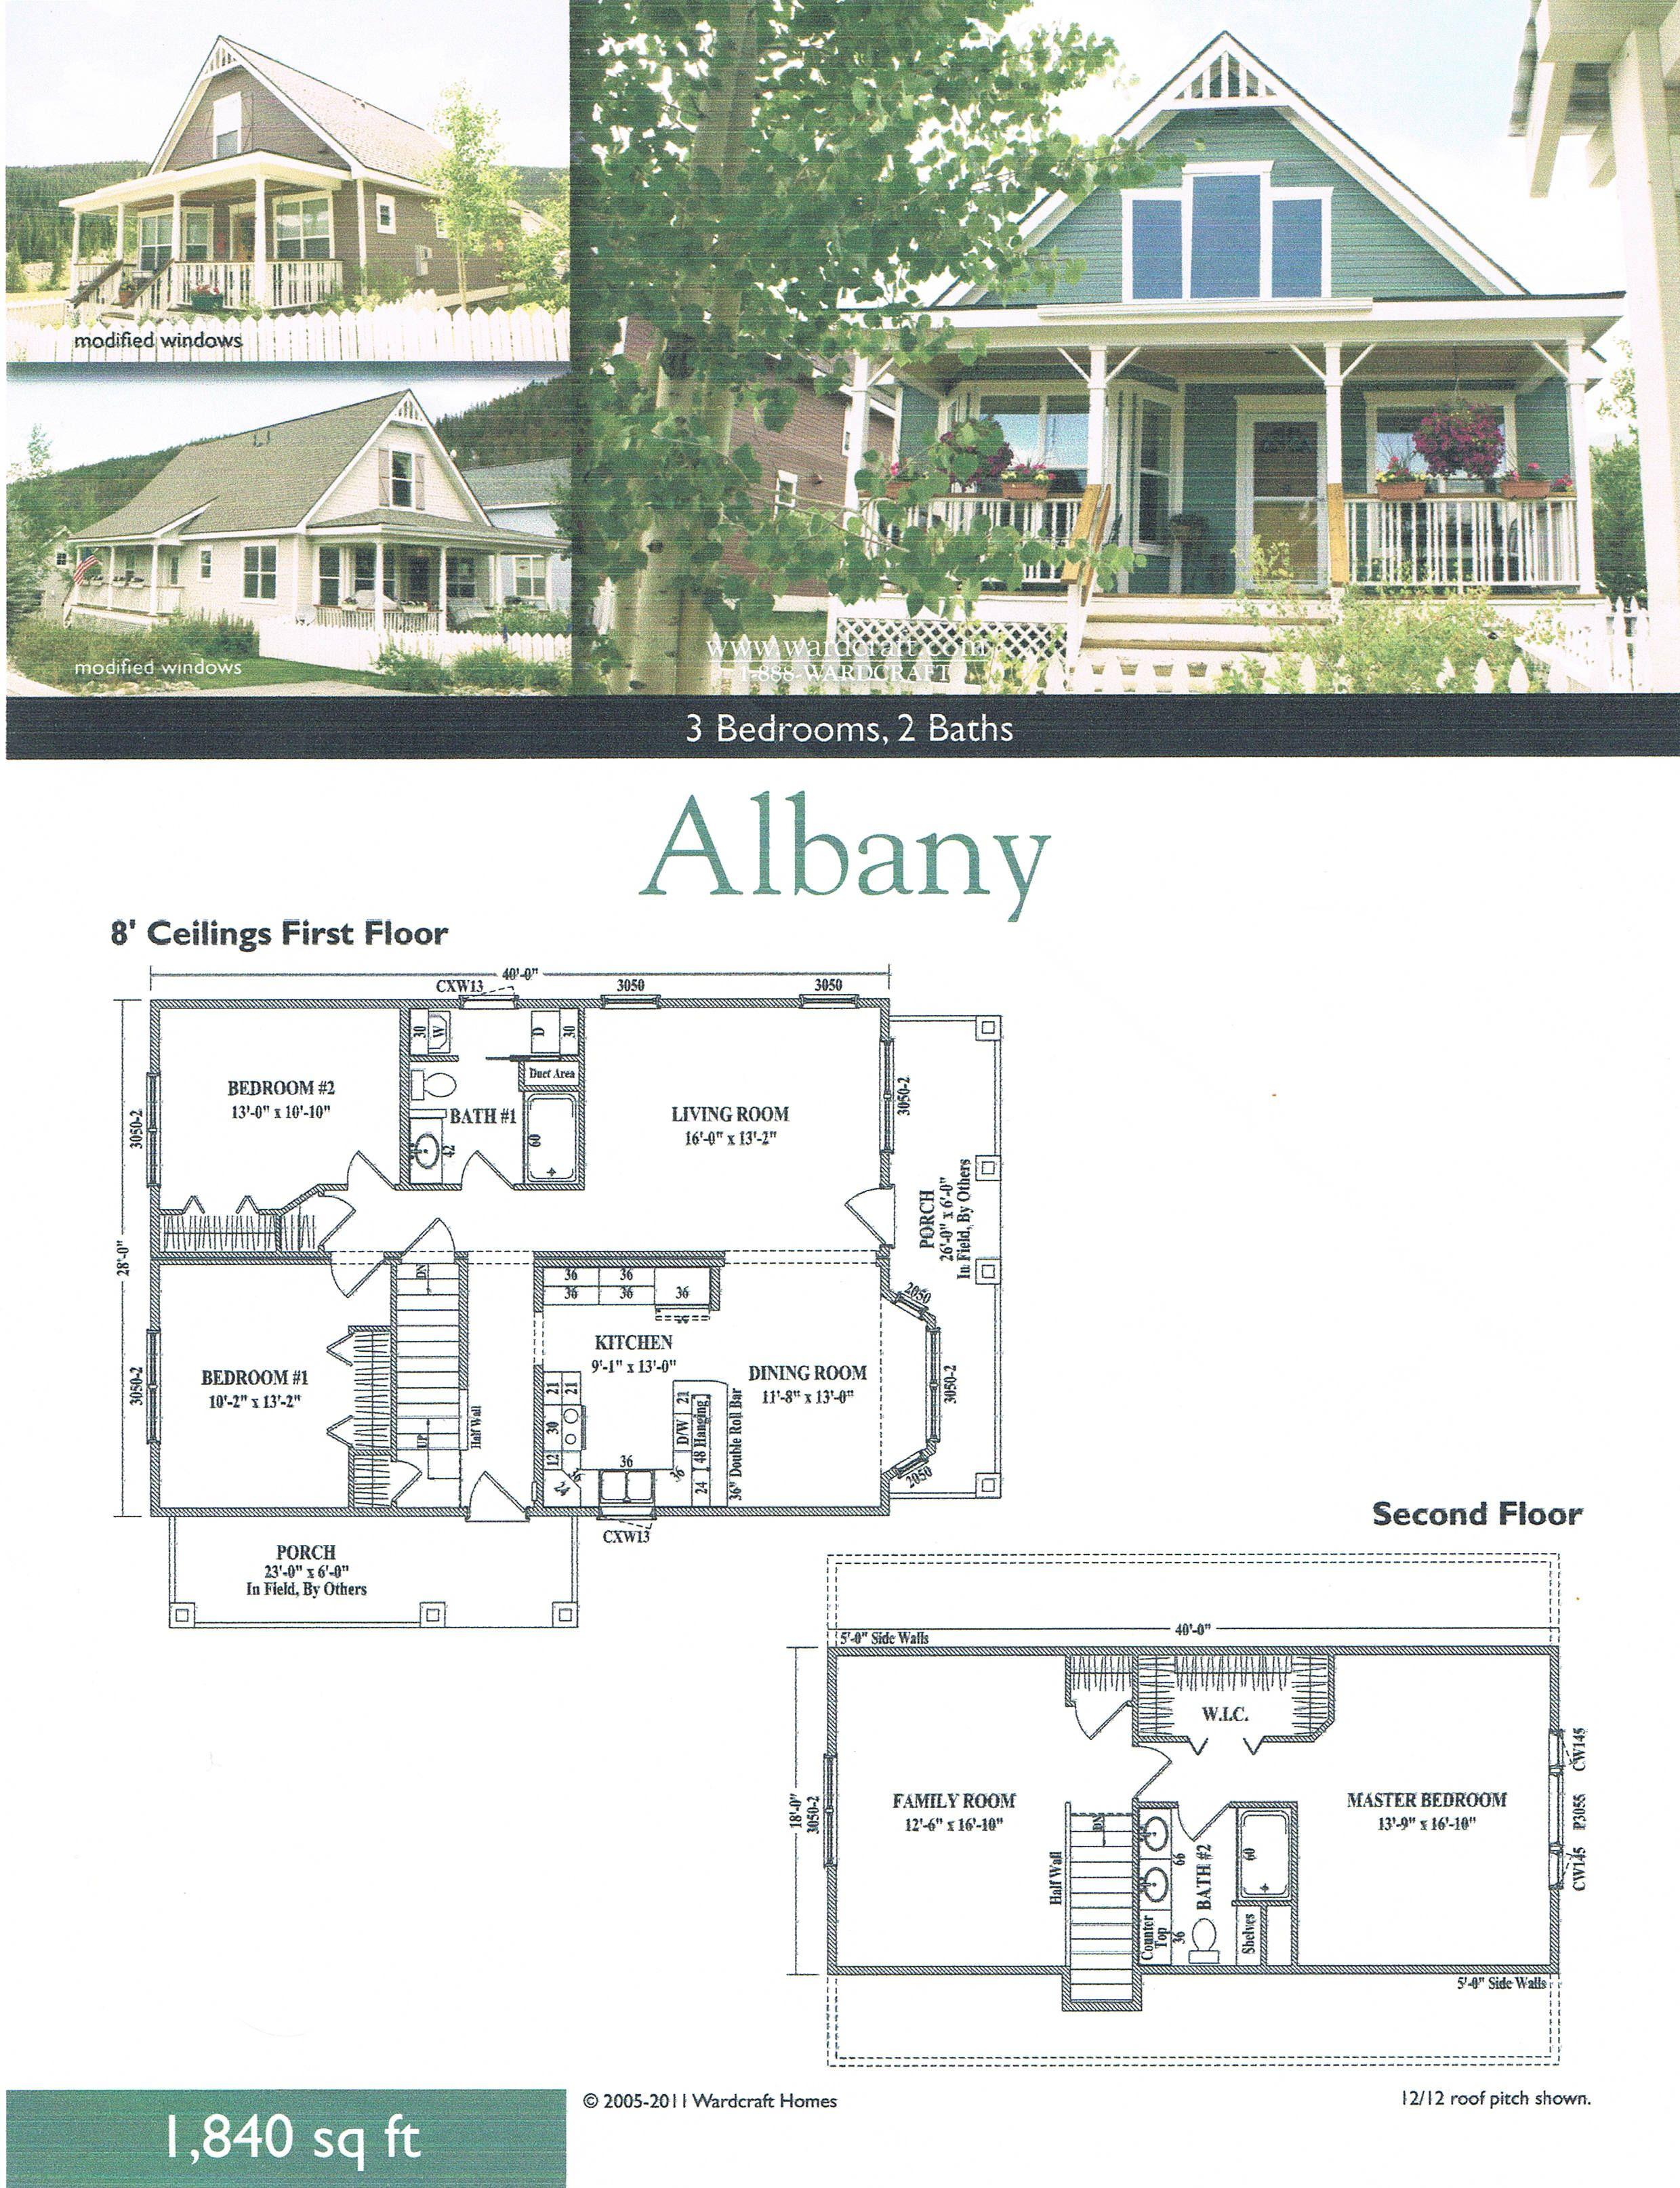 Wardcraft Homes - Albany Plan  http://www.wardcraft.com/Floor-Plans/albany.pdf